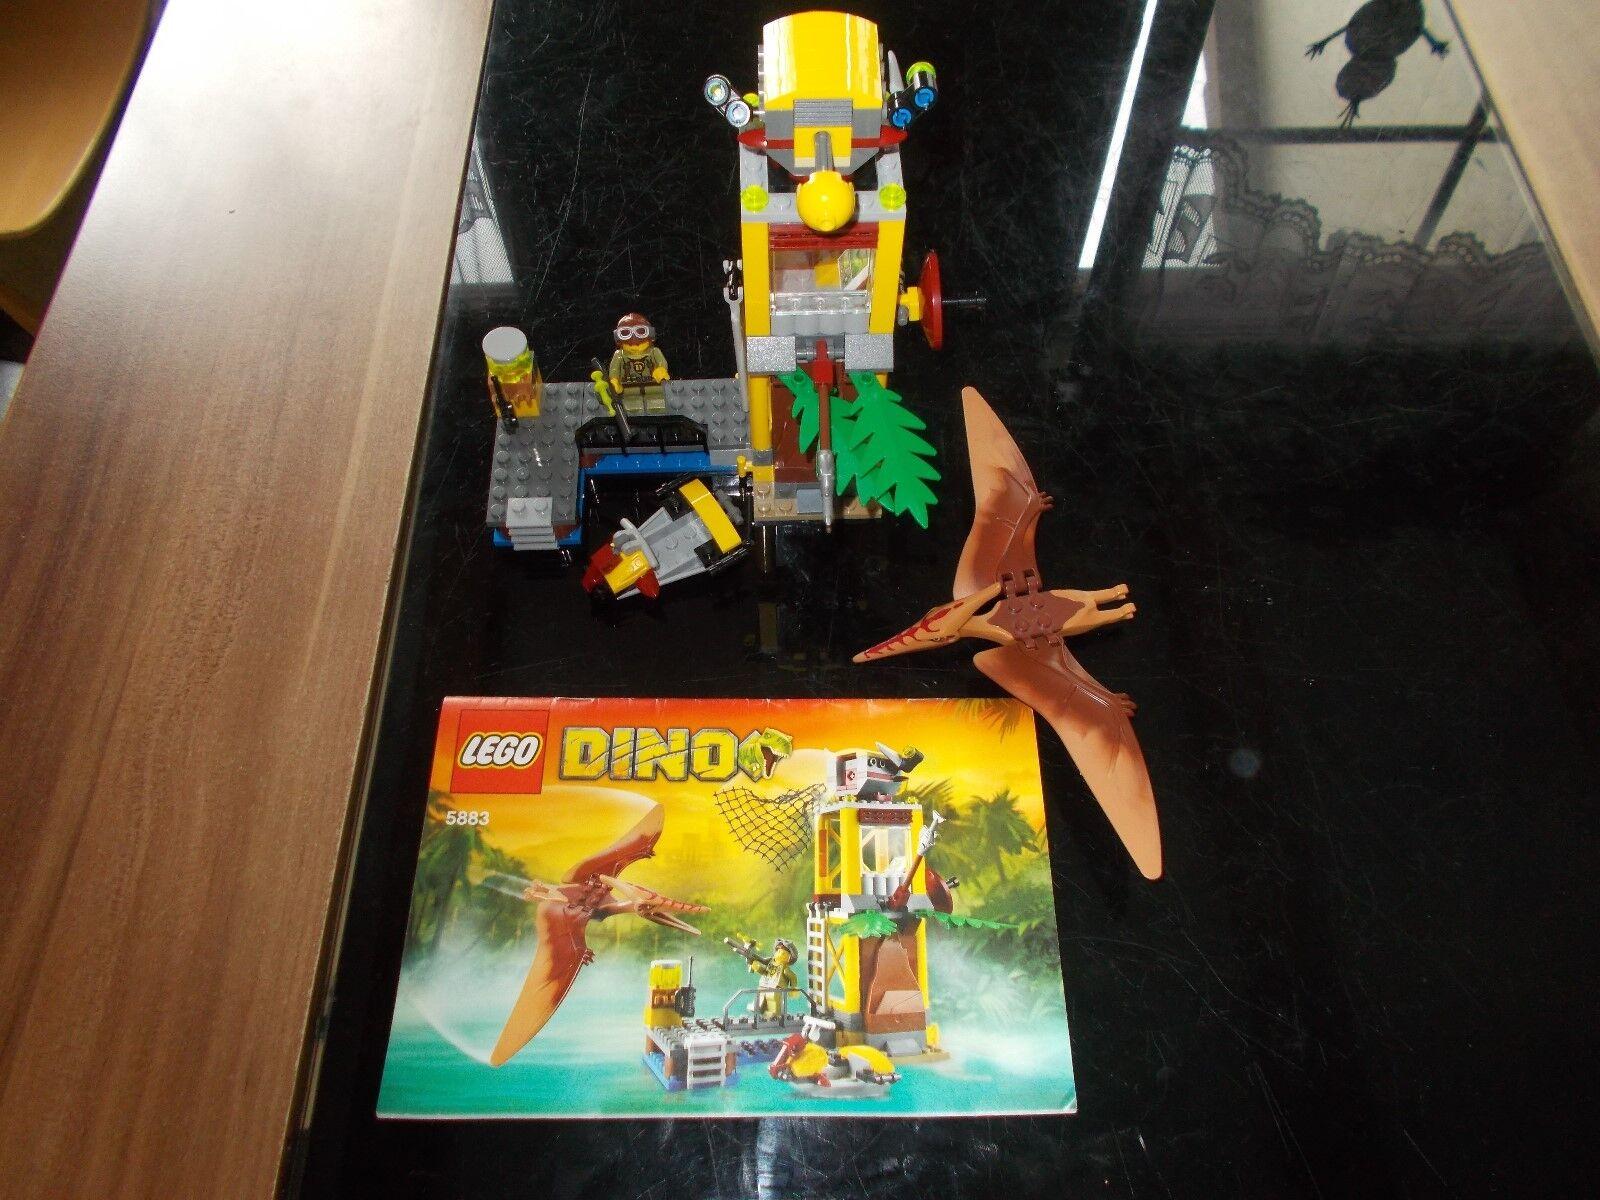 LEGO ® Dino - 5883-Dinosaure Pteranodon piège-Avec de recette (BA)